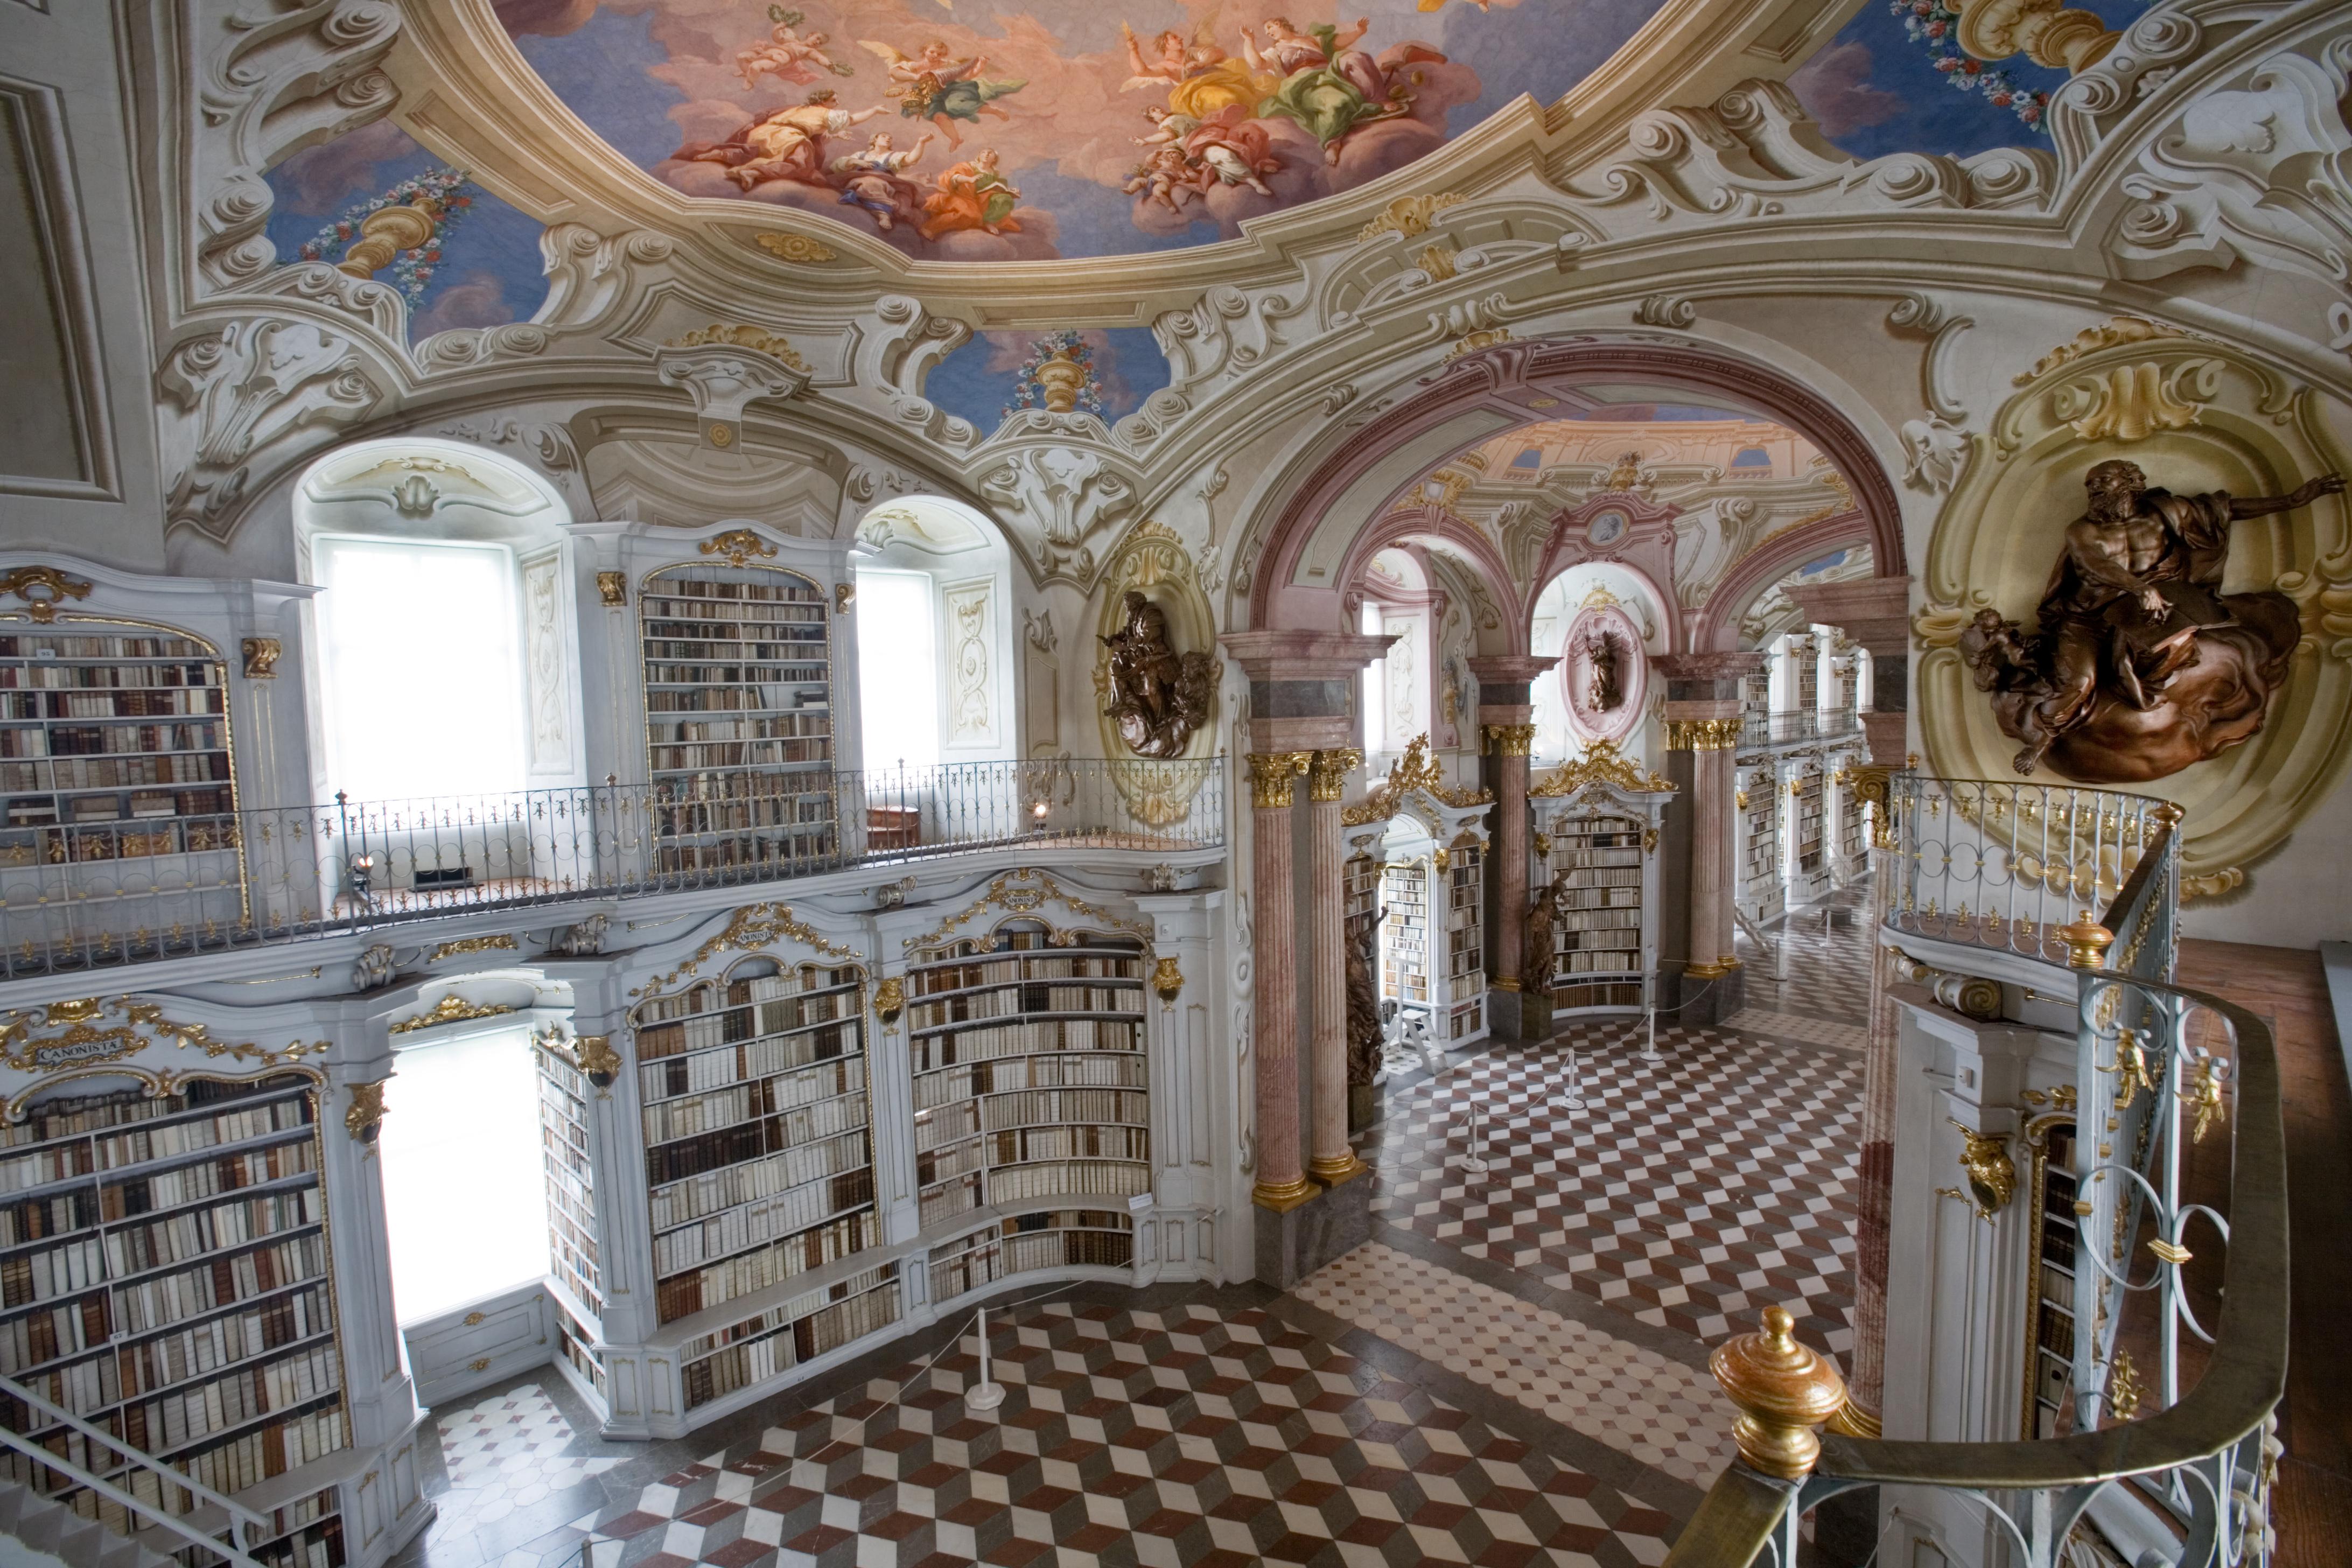 Admont Austria  City pictures : Austria Admont Abbey Library 1246 Wikimedia Commons